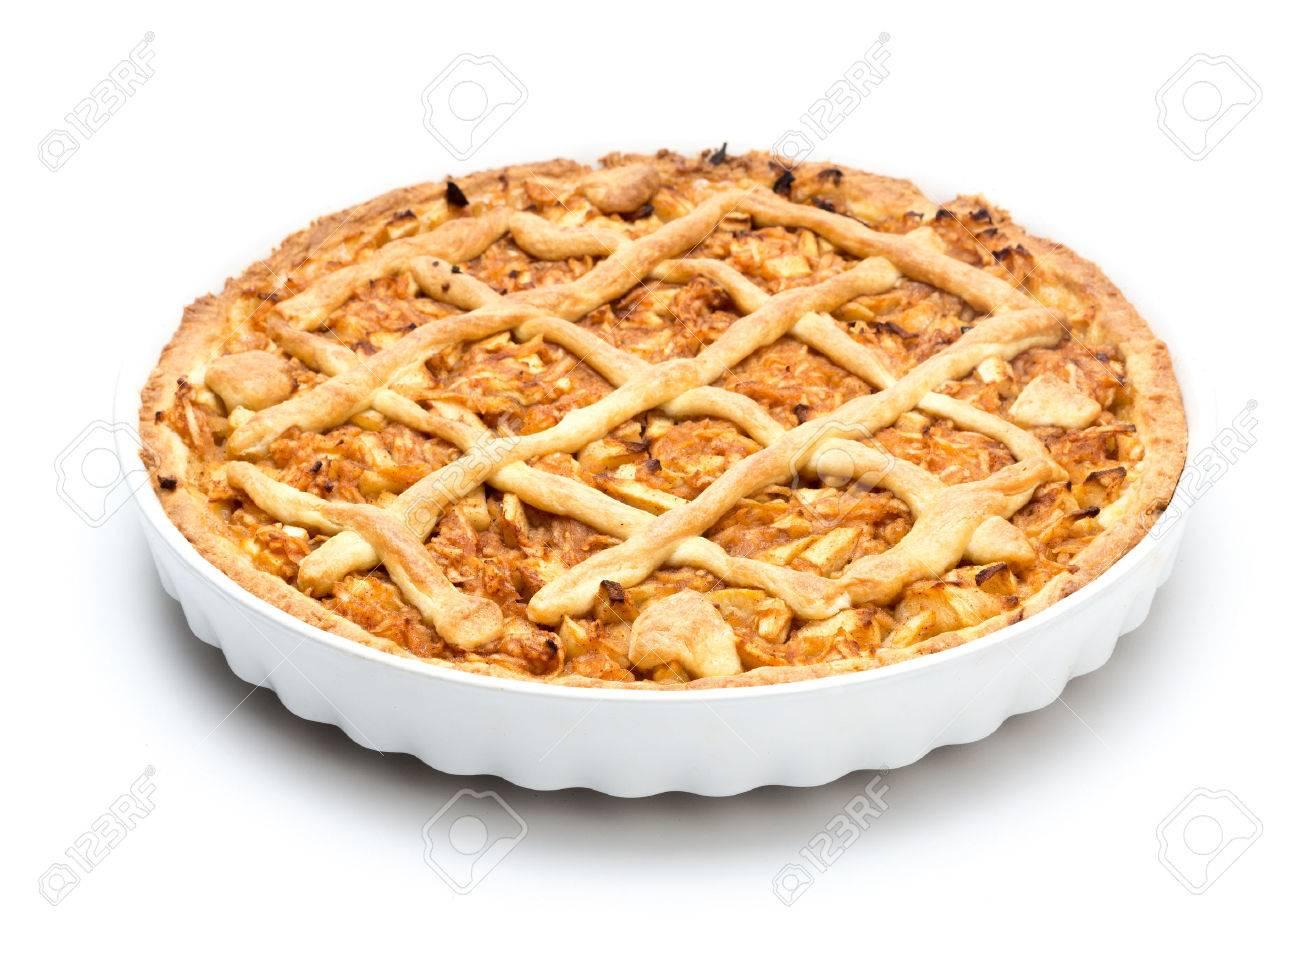 Apple pie in white ceramic pan on white background Stock Photo - 44982505